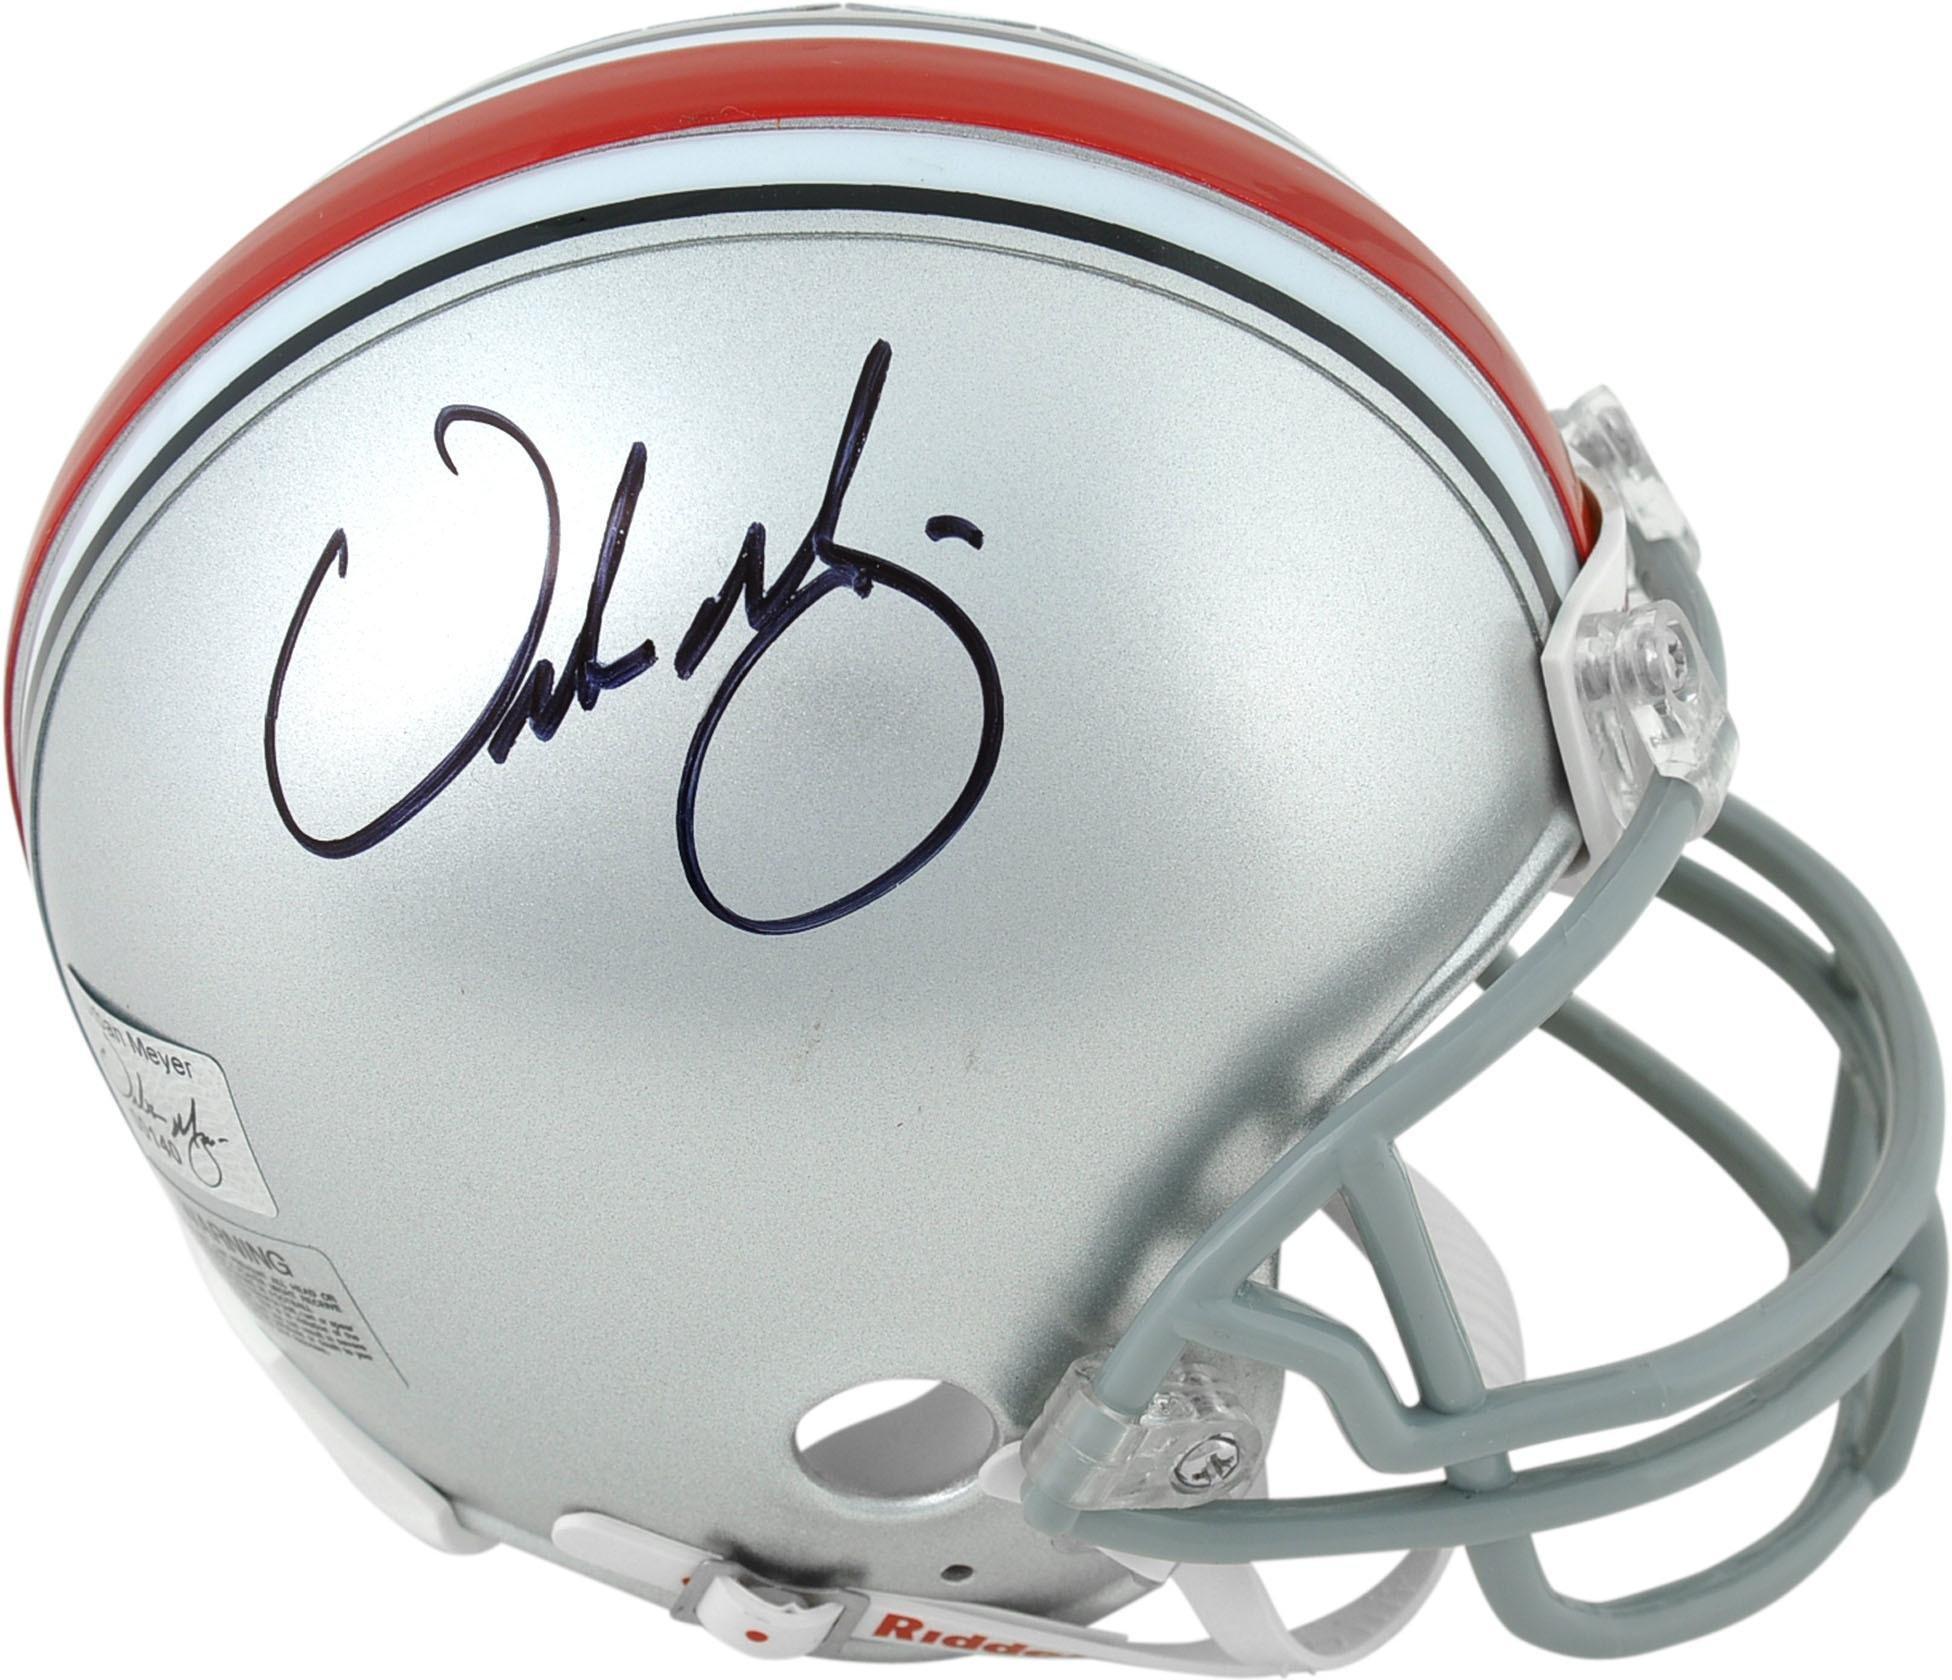 Urban Meyer Ohio State Buckeyes Autographed Mini Helmet Fanatics Authentic Certified Autographed College Mini Helmets